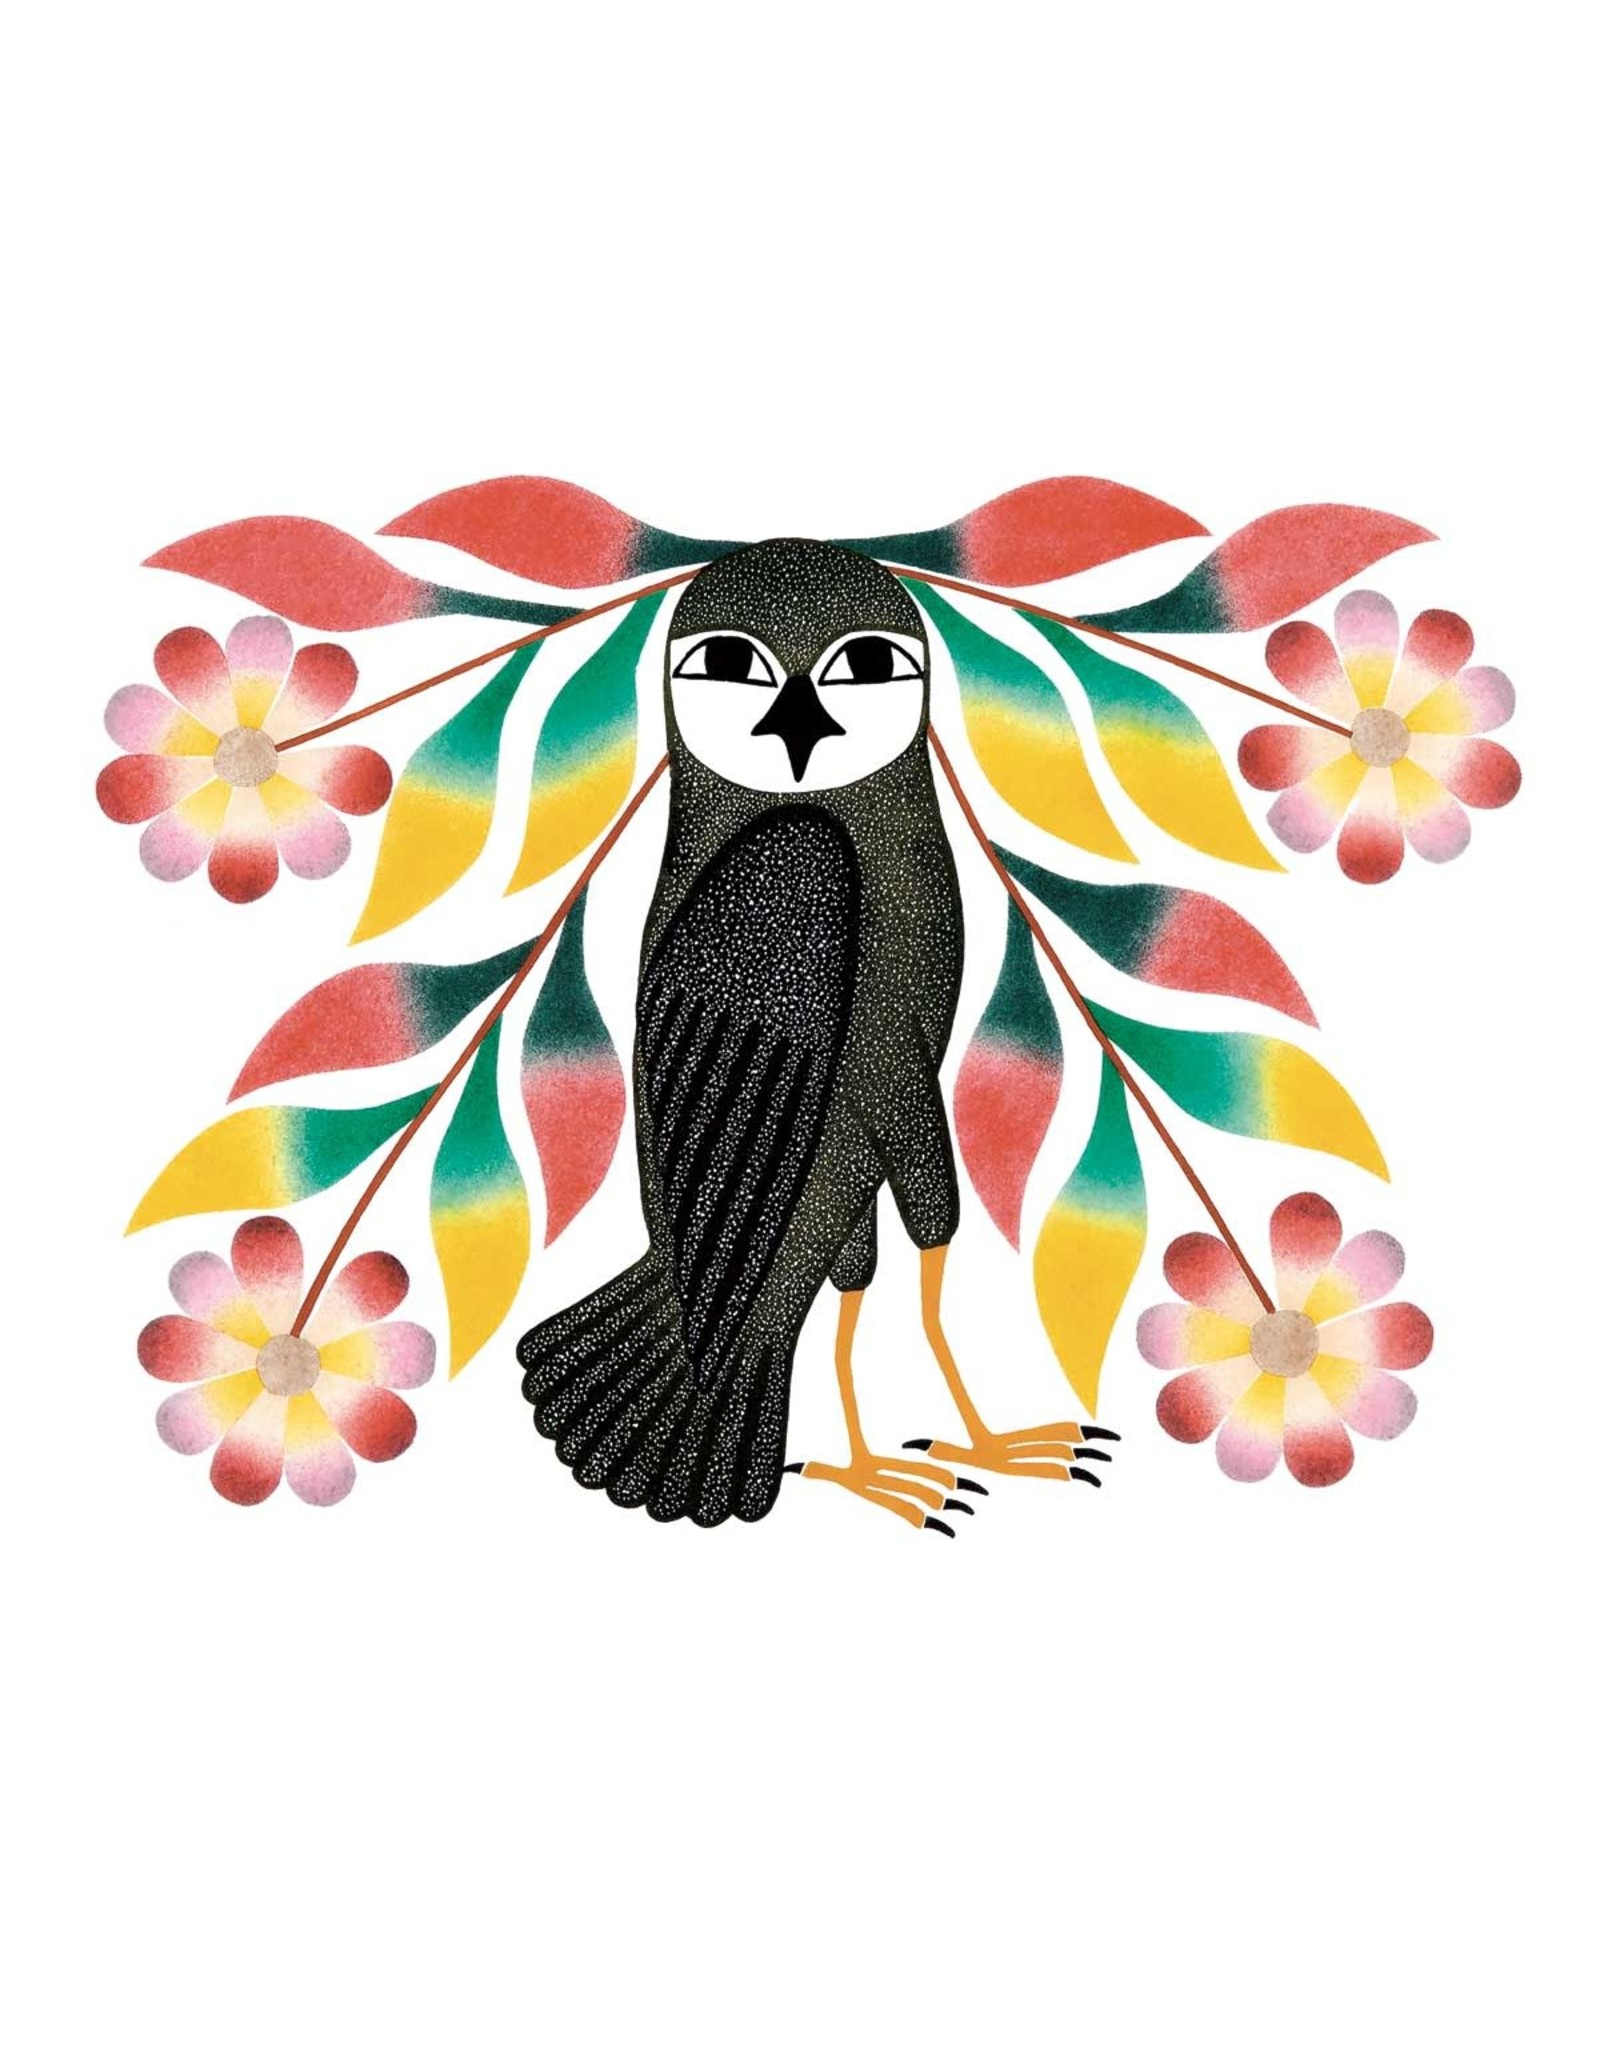 Owl's Bouquet, 2007 by Kenojuak Ashevak Framed